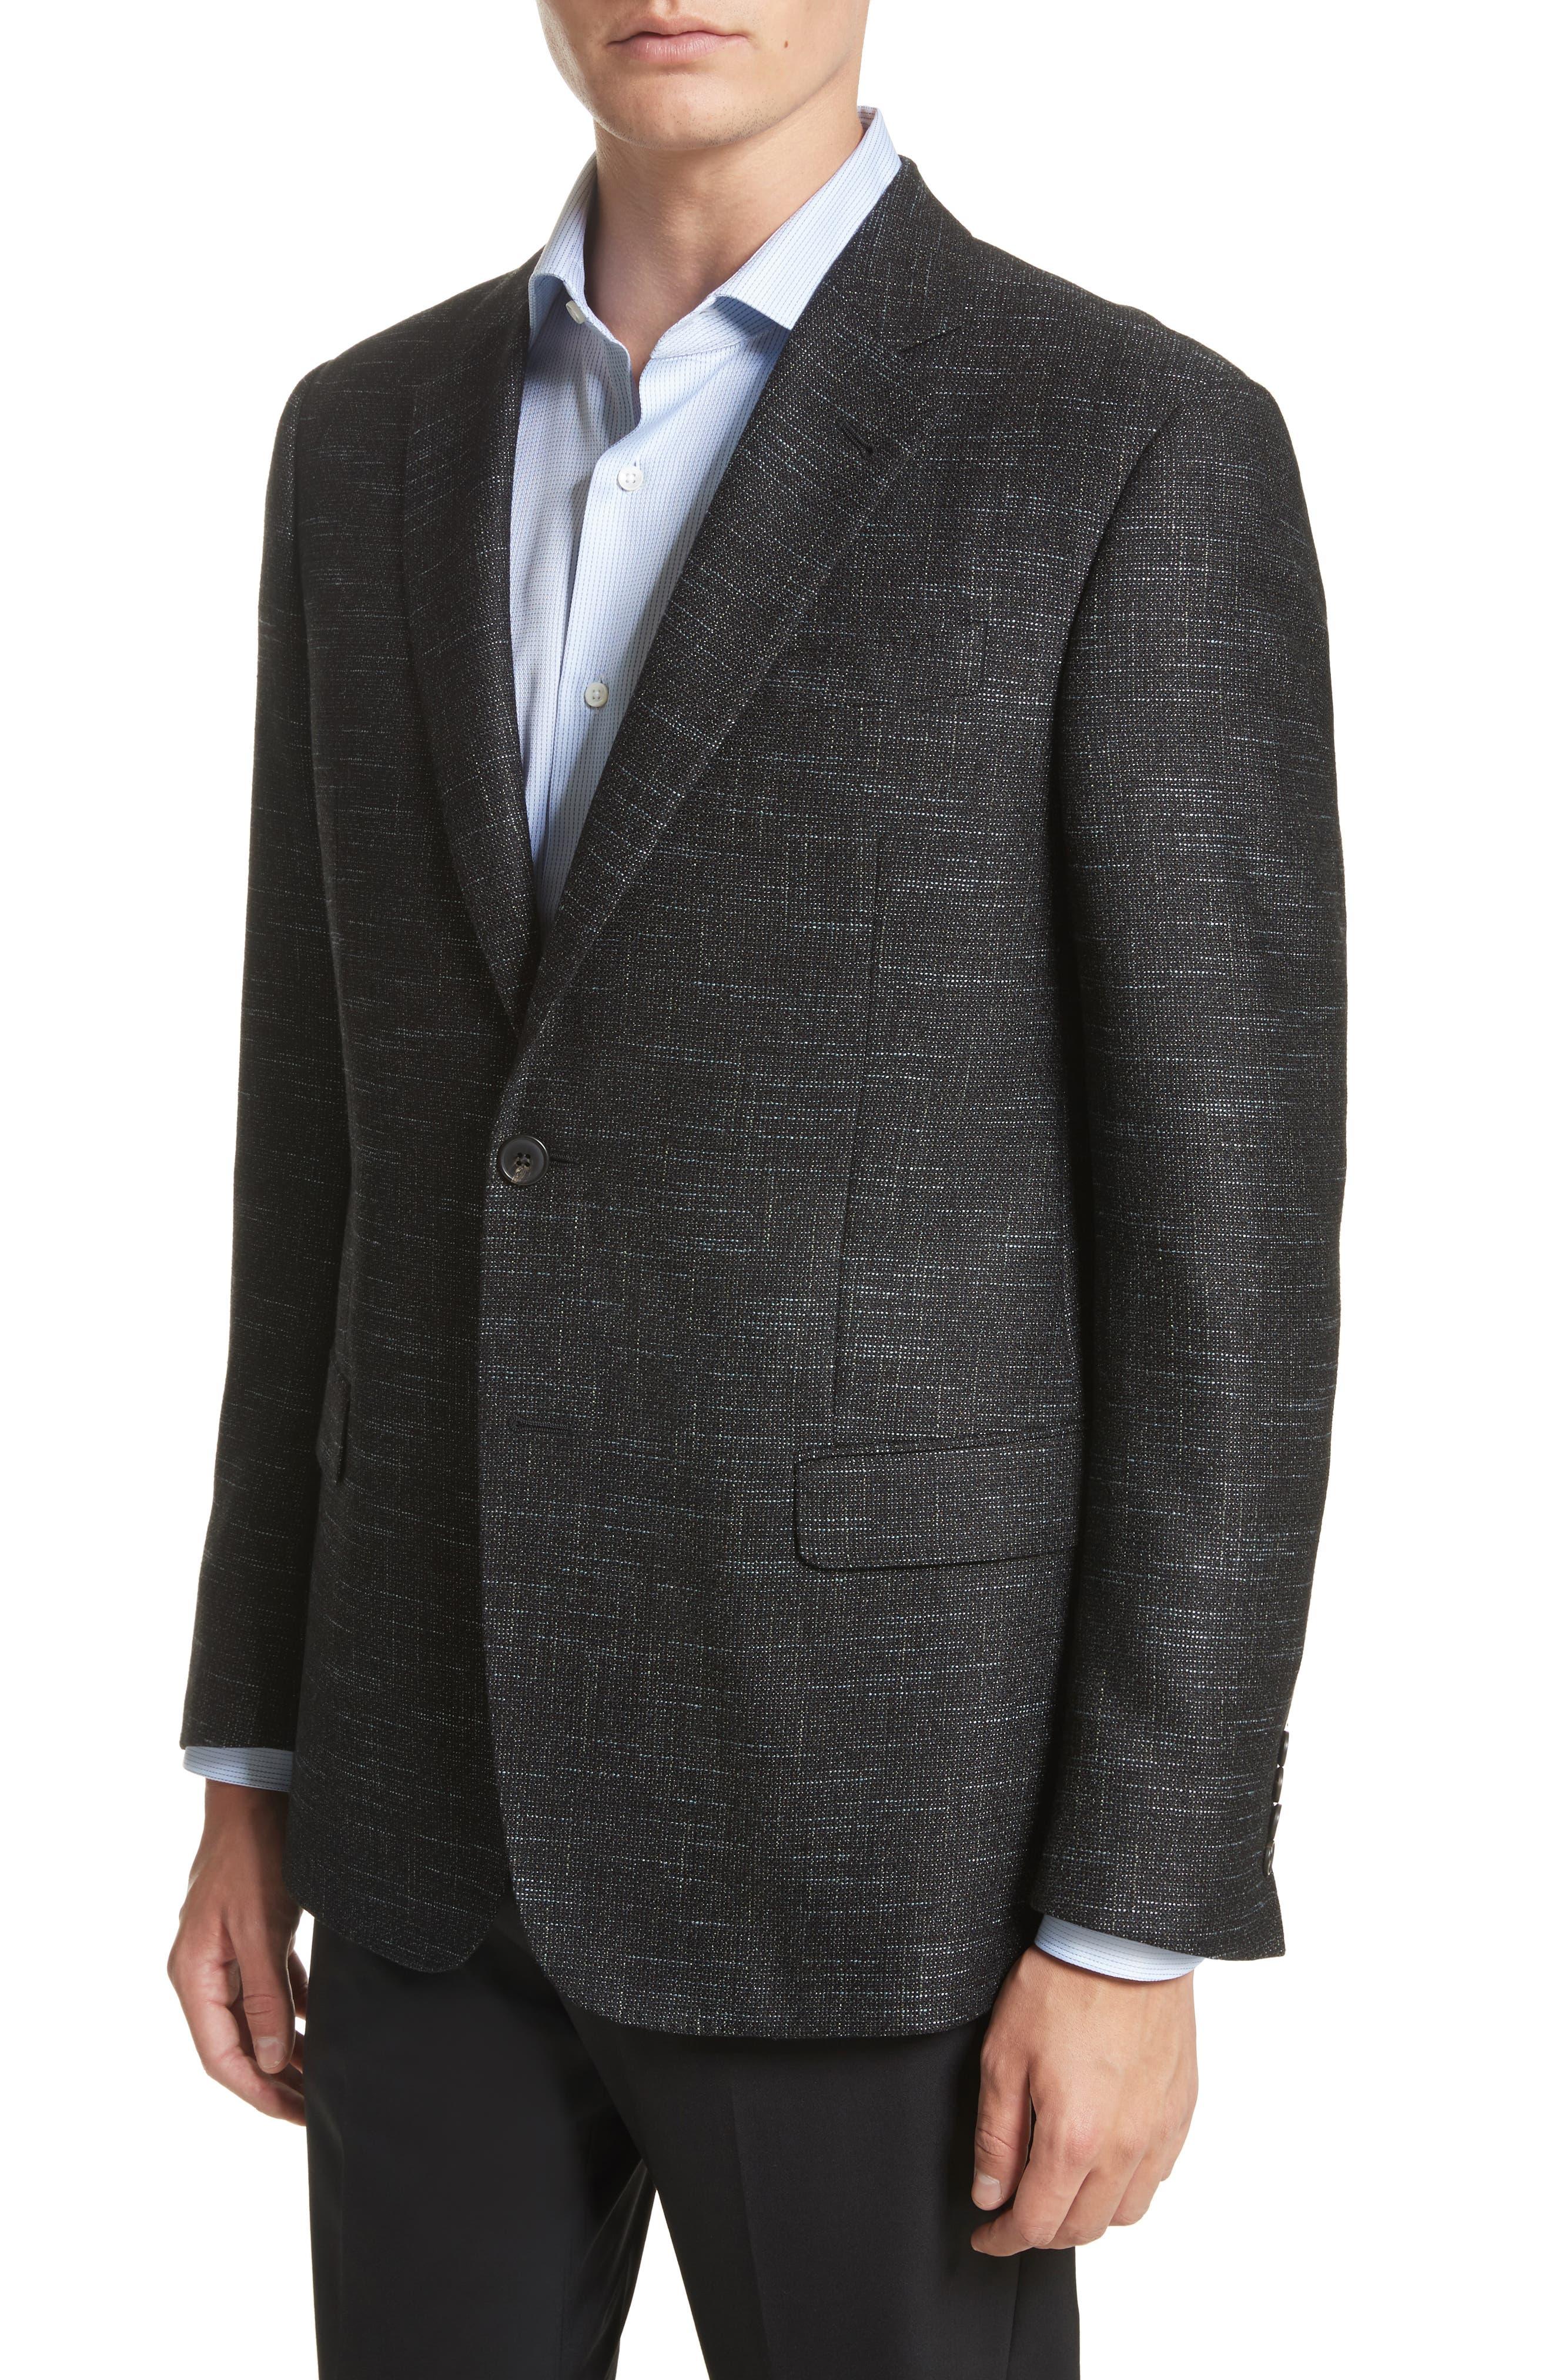 G-Line Trim Fit Wool Blend Blazer,                             Alternate thumbnail 4, color,                             355